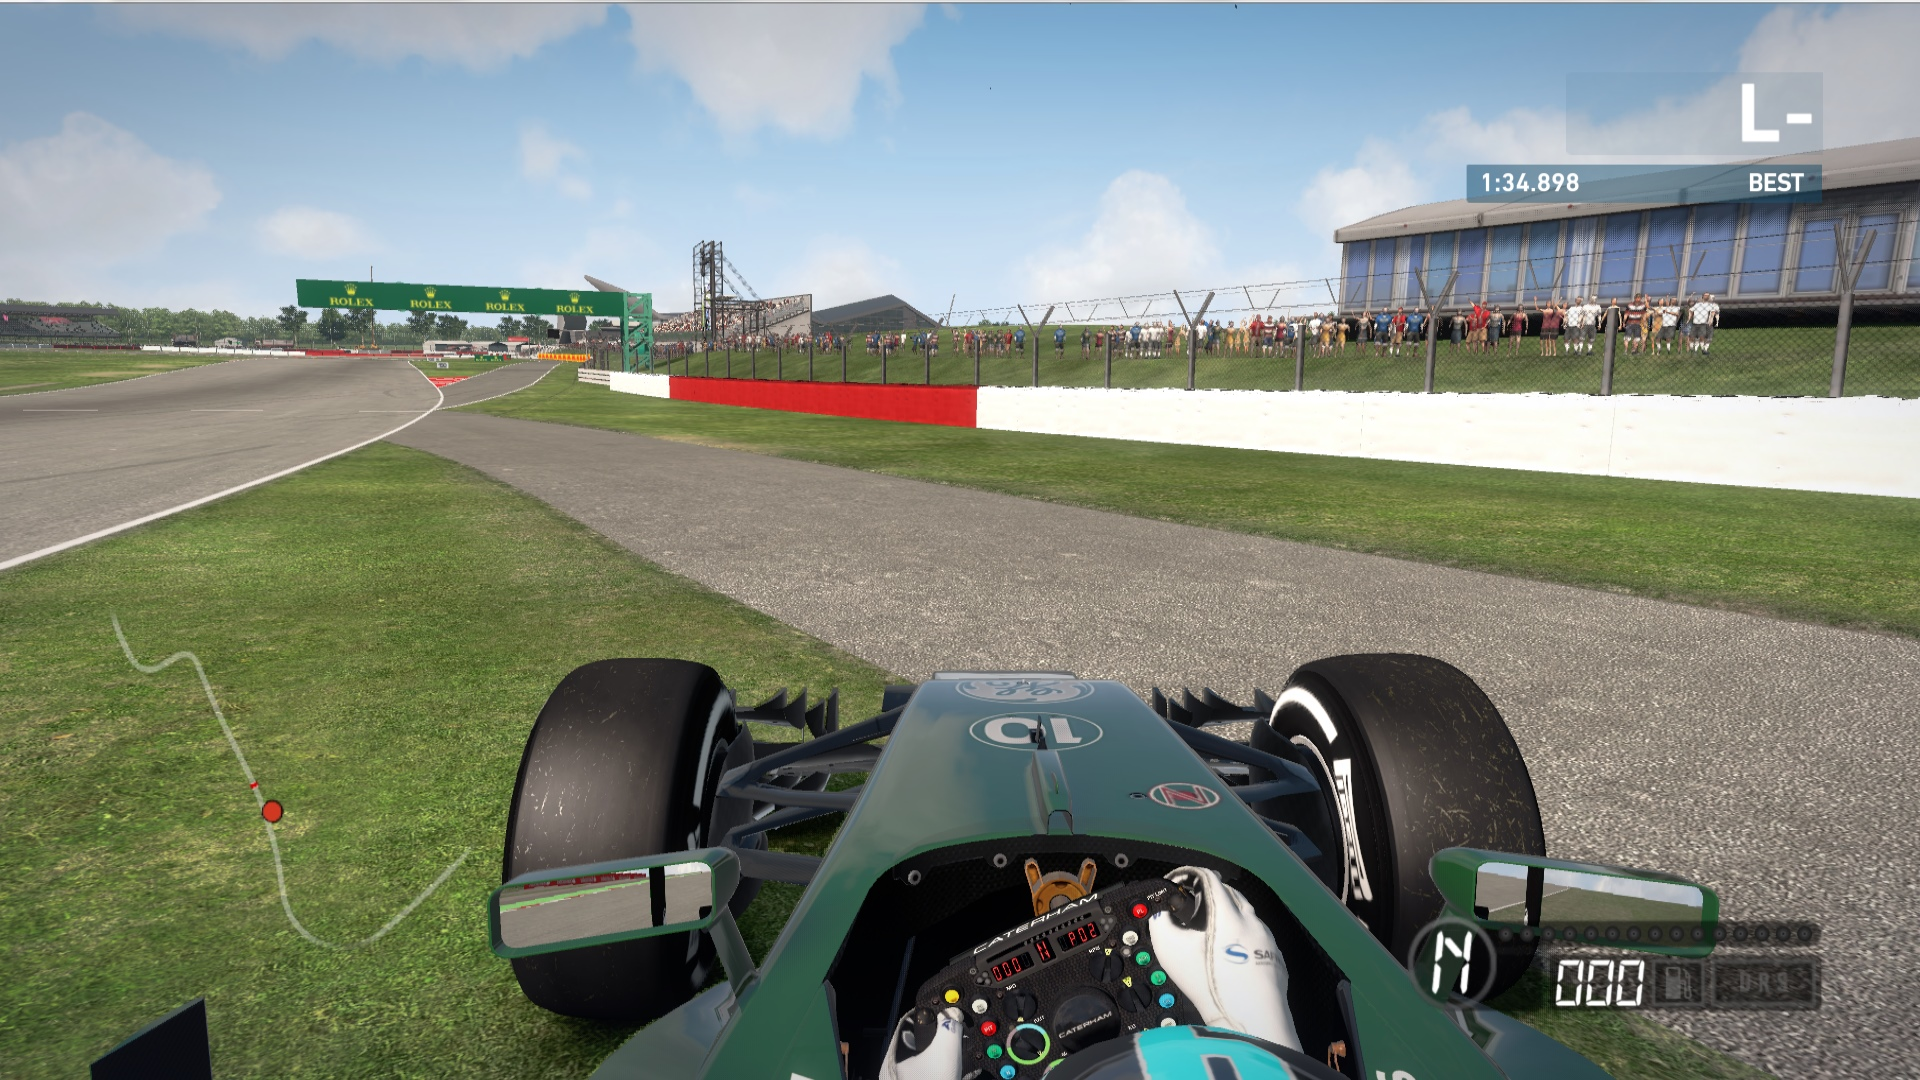 Silverstone5.jpg